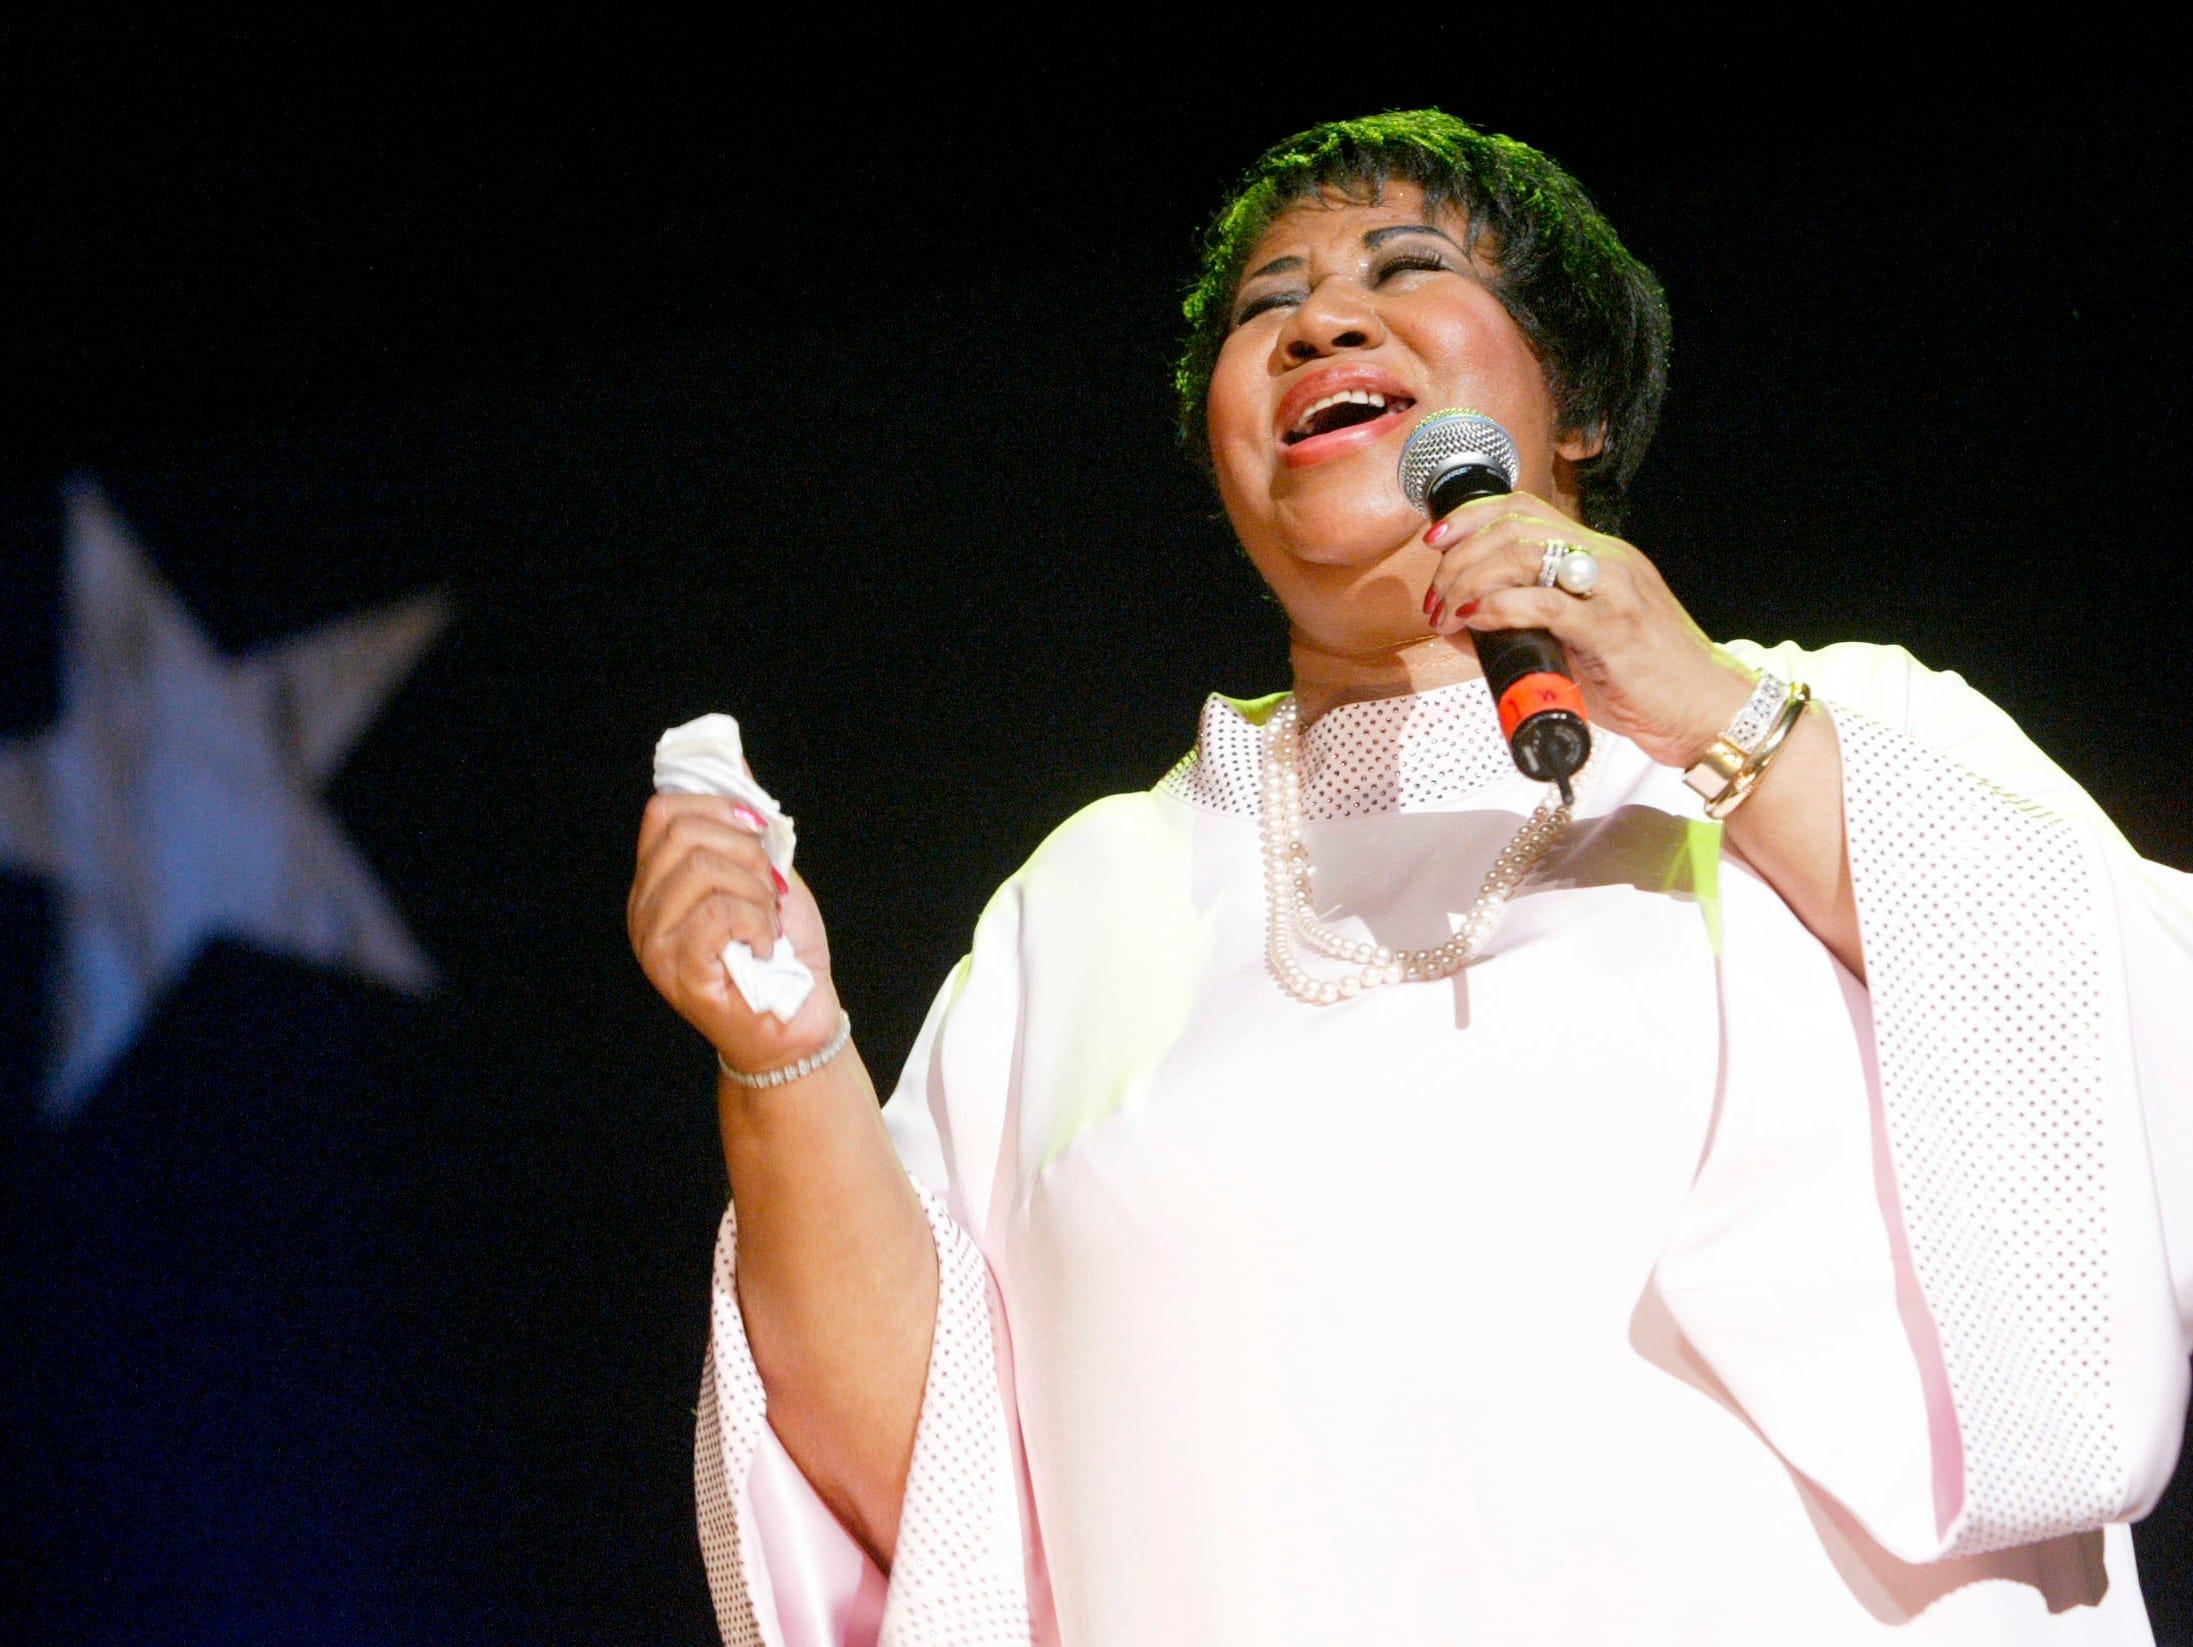 Let us now pay r-e-s-p-e-c-t to the late Queen of Soul | Mark Hinson